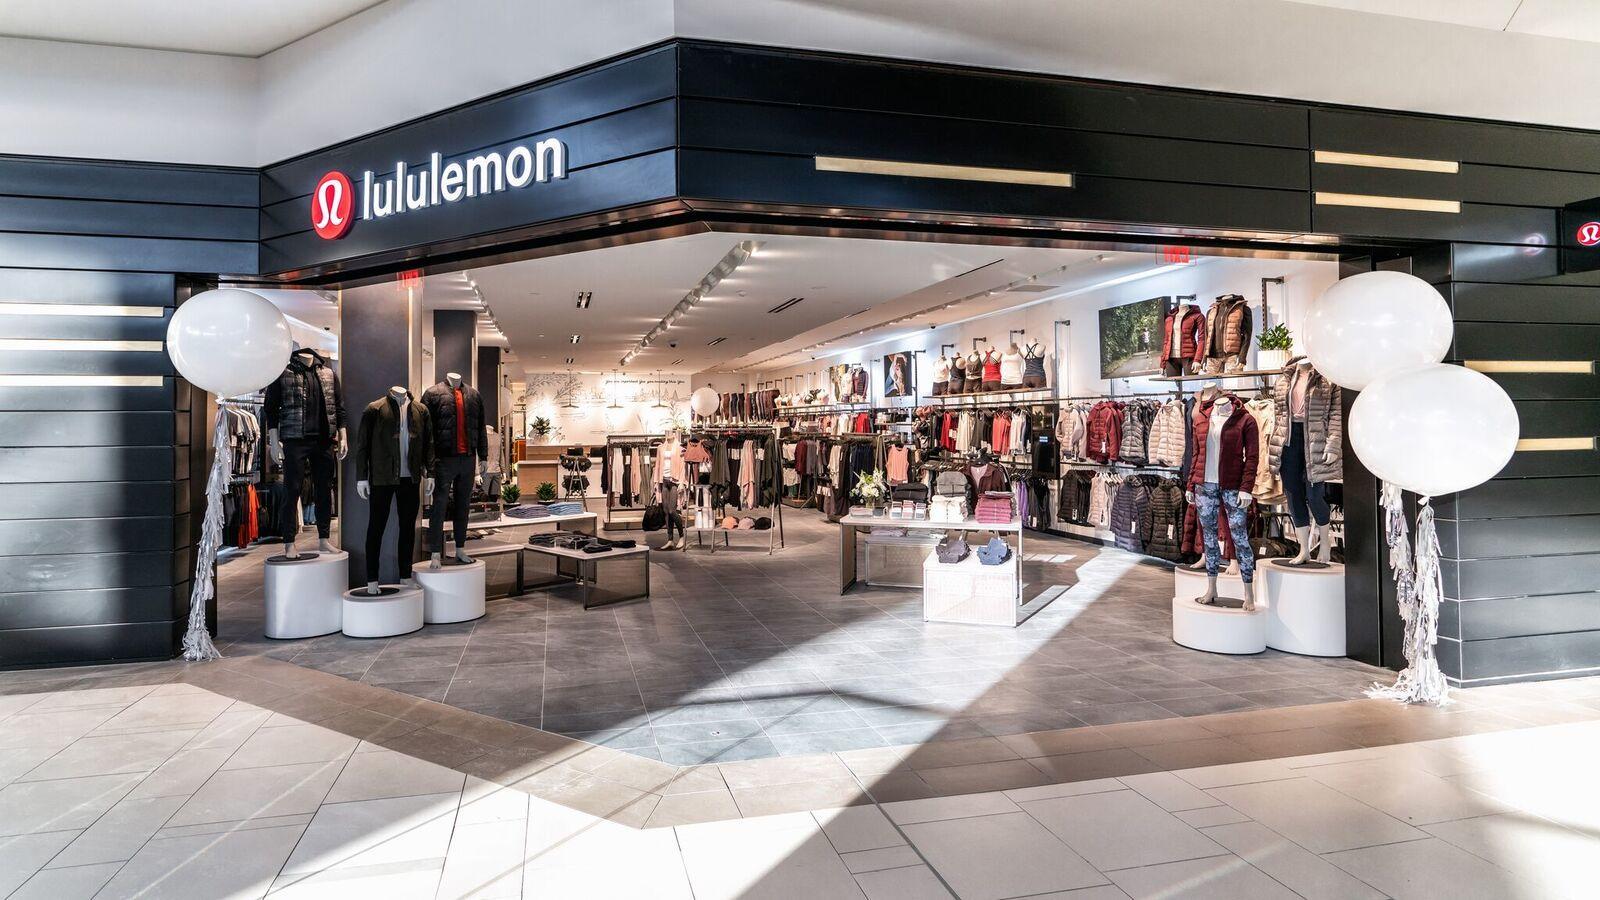 lululemon image 0